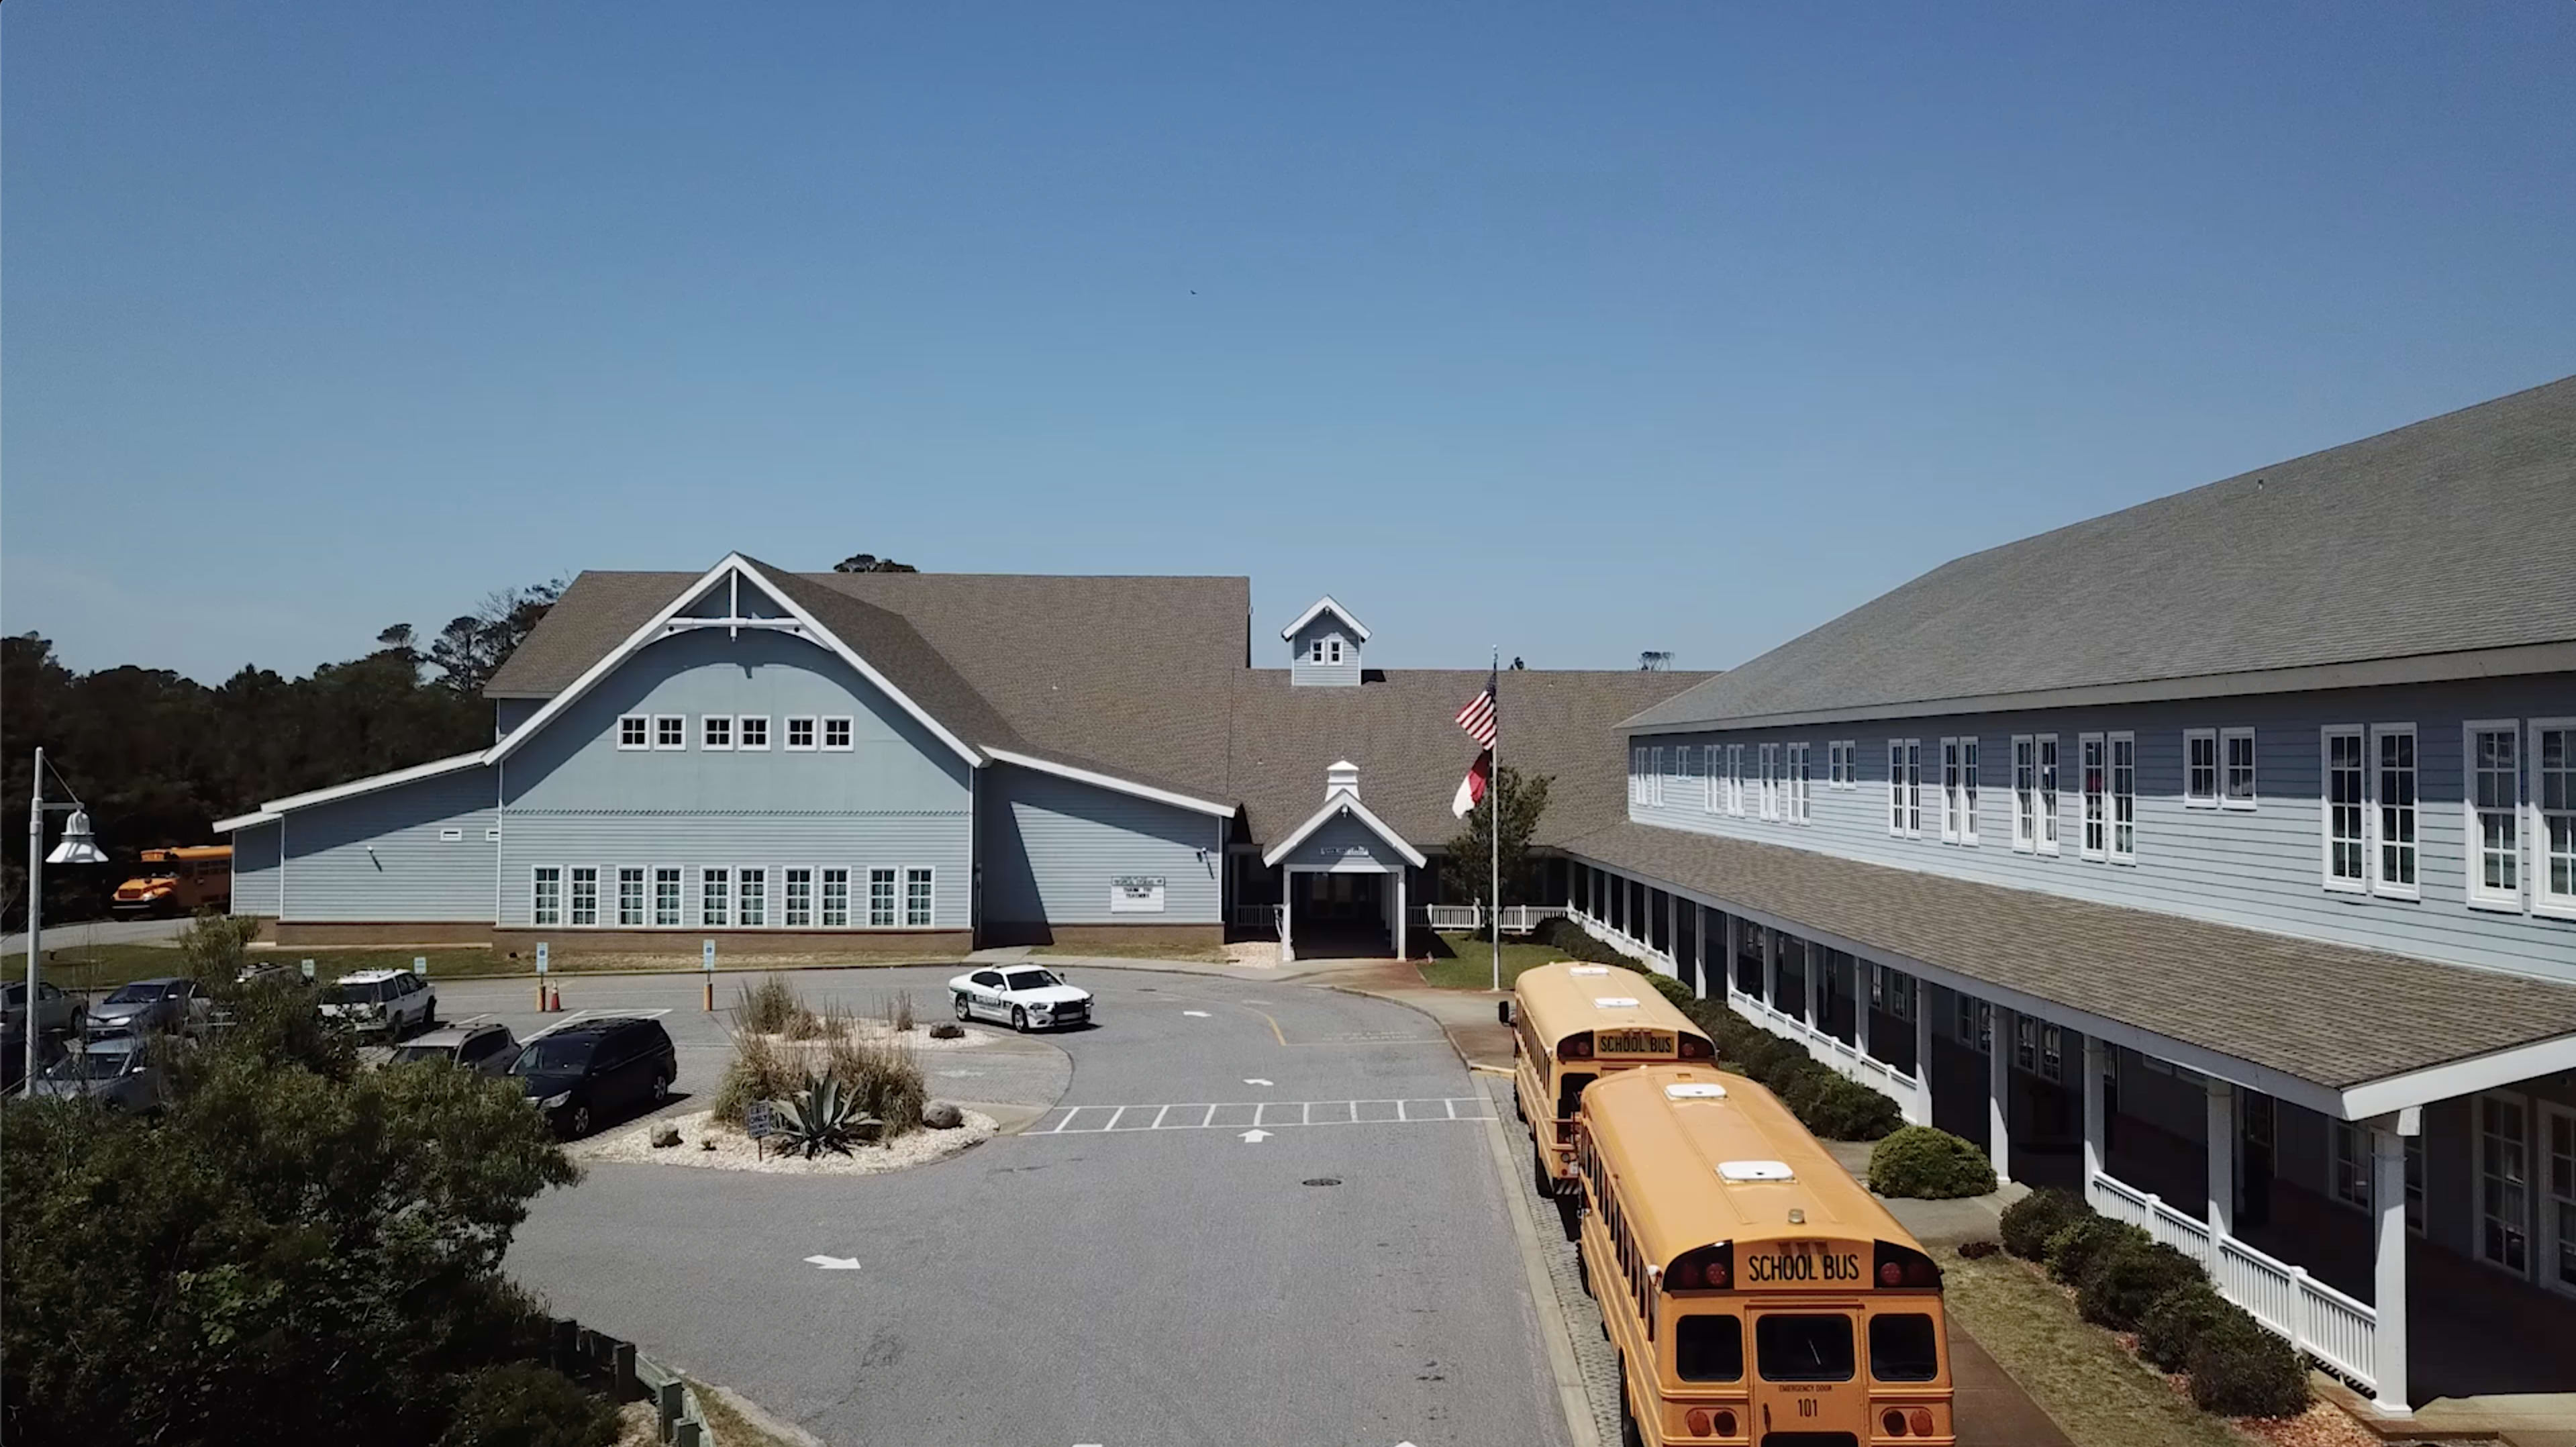 Home - Cape Hatteras Elementary School Regarding Dare County First Flight High School Calendar